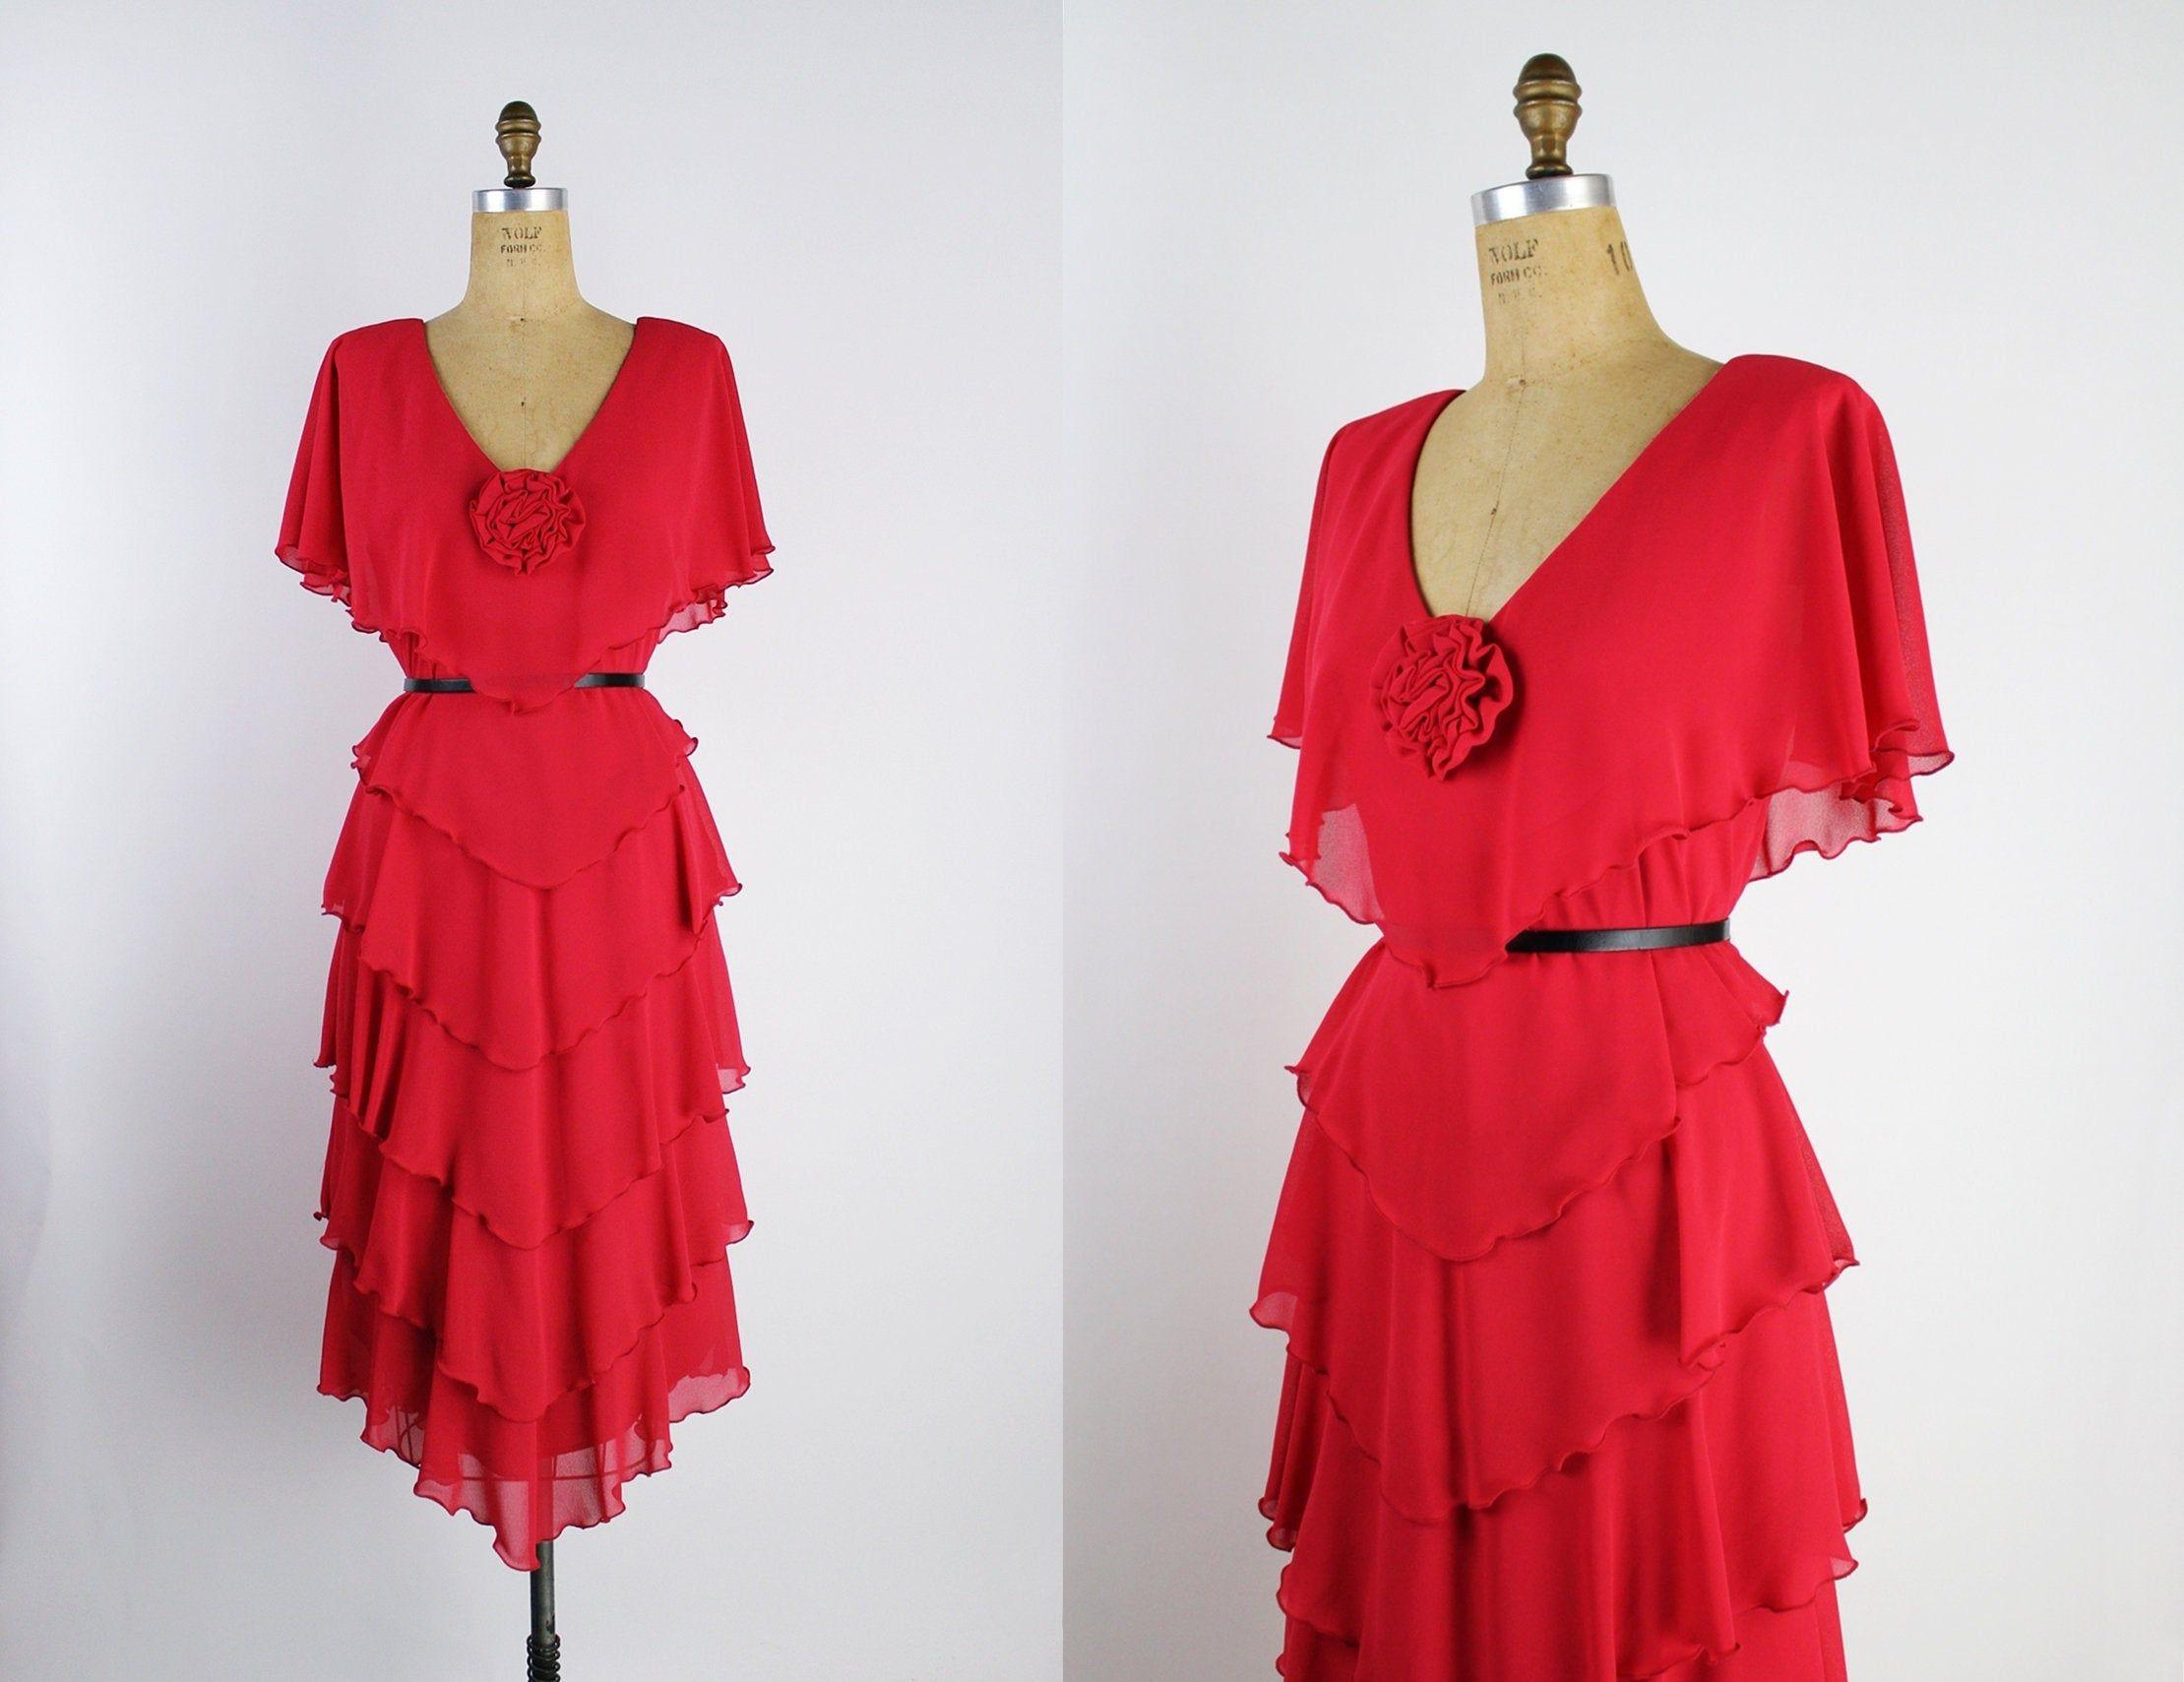 80s Red Ruffle Dress 1980s Dress Party Dress Bohemian Dress Vintage Red Dress Cocktail Dress Size S M Red Cocktail Dress Bohemian Dress Vintage Red Dress [ 1709 x 2219 Pixel ]